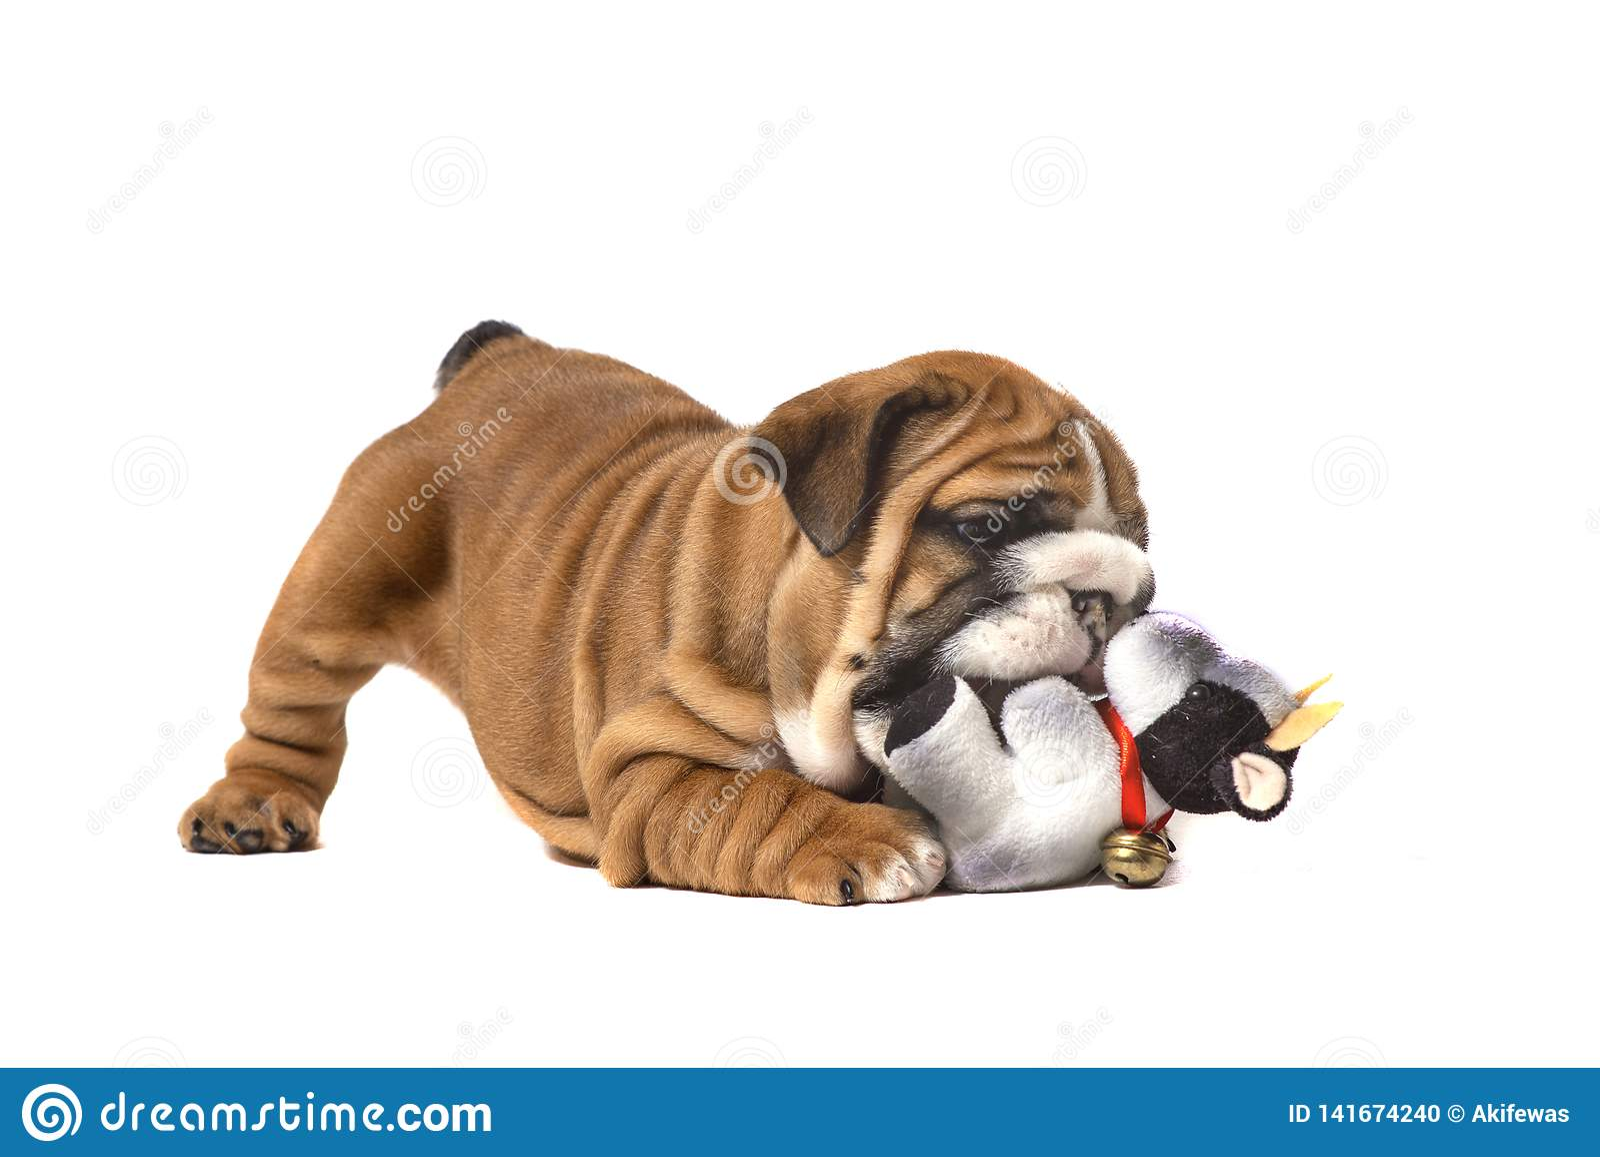 English bulldog puppy playing on white background